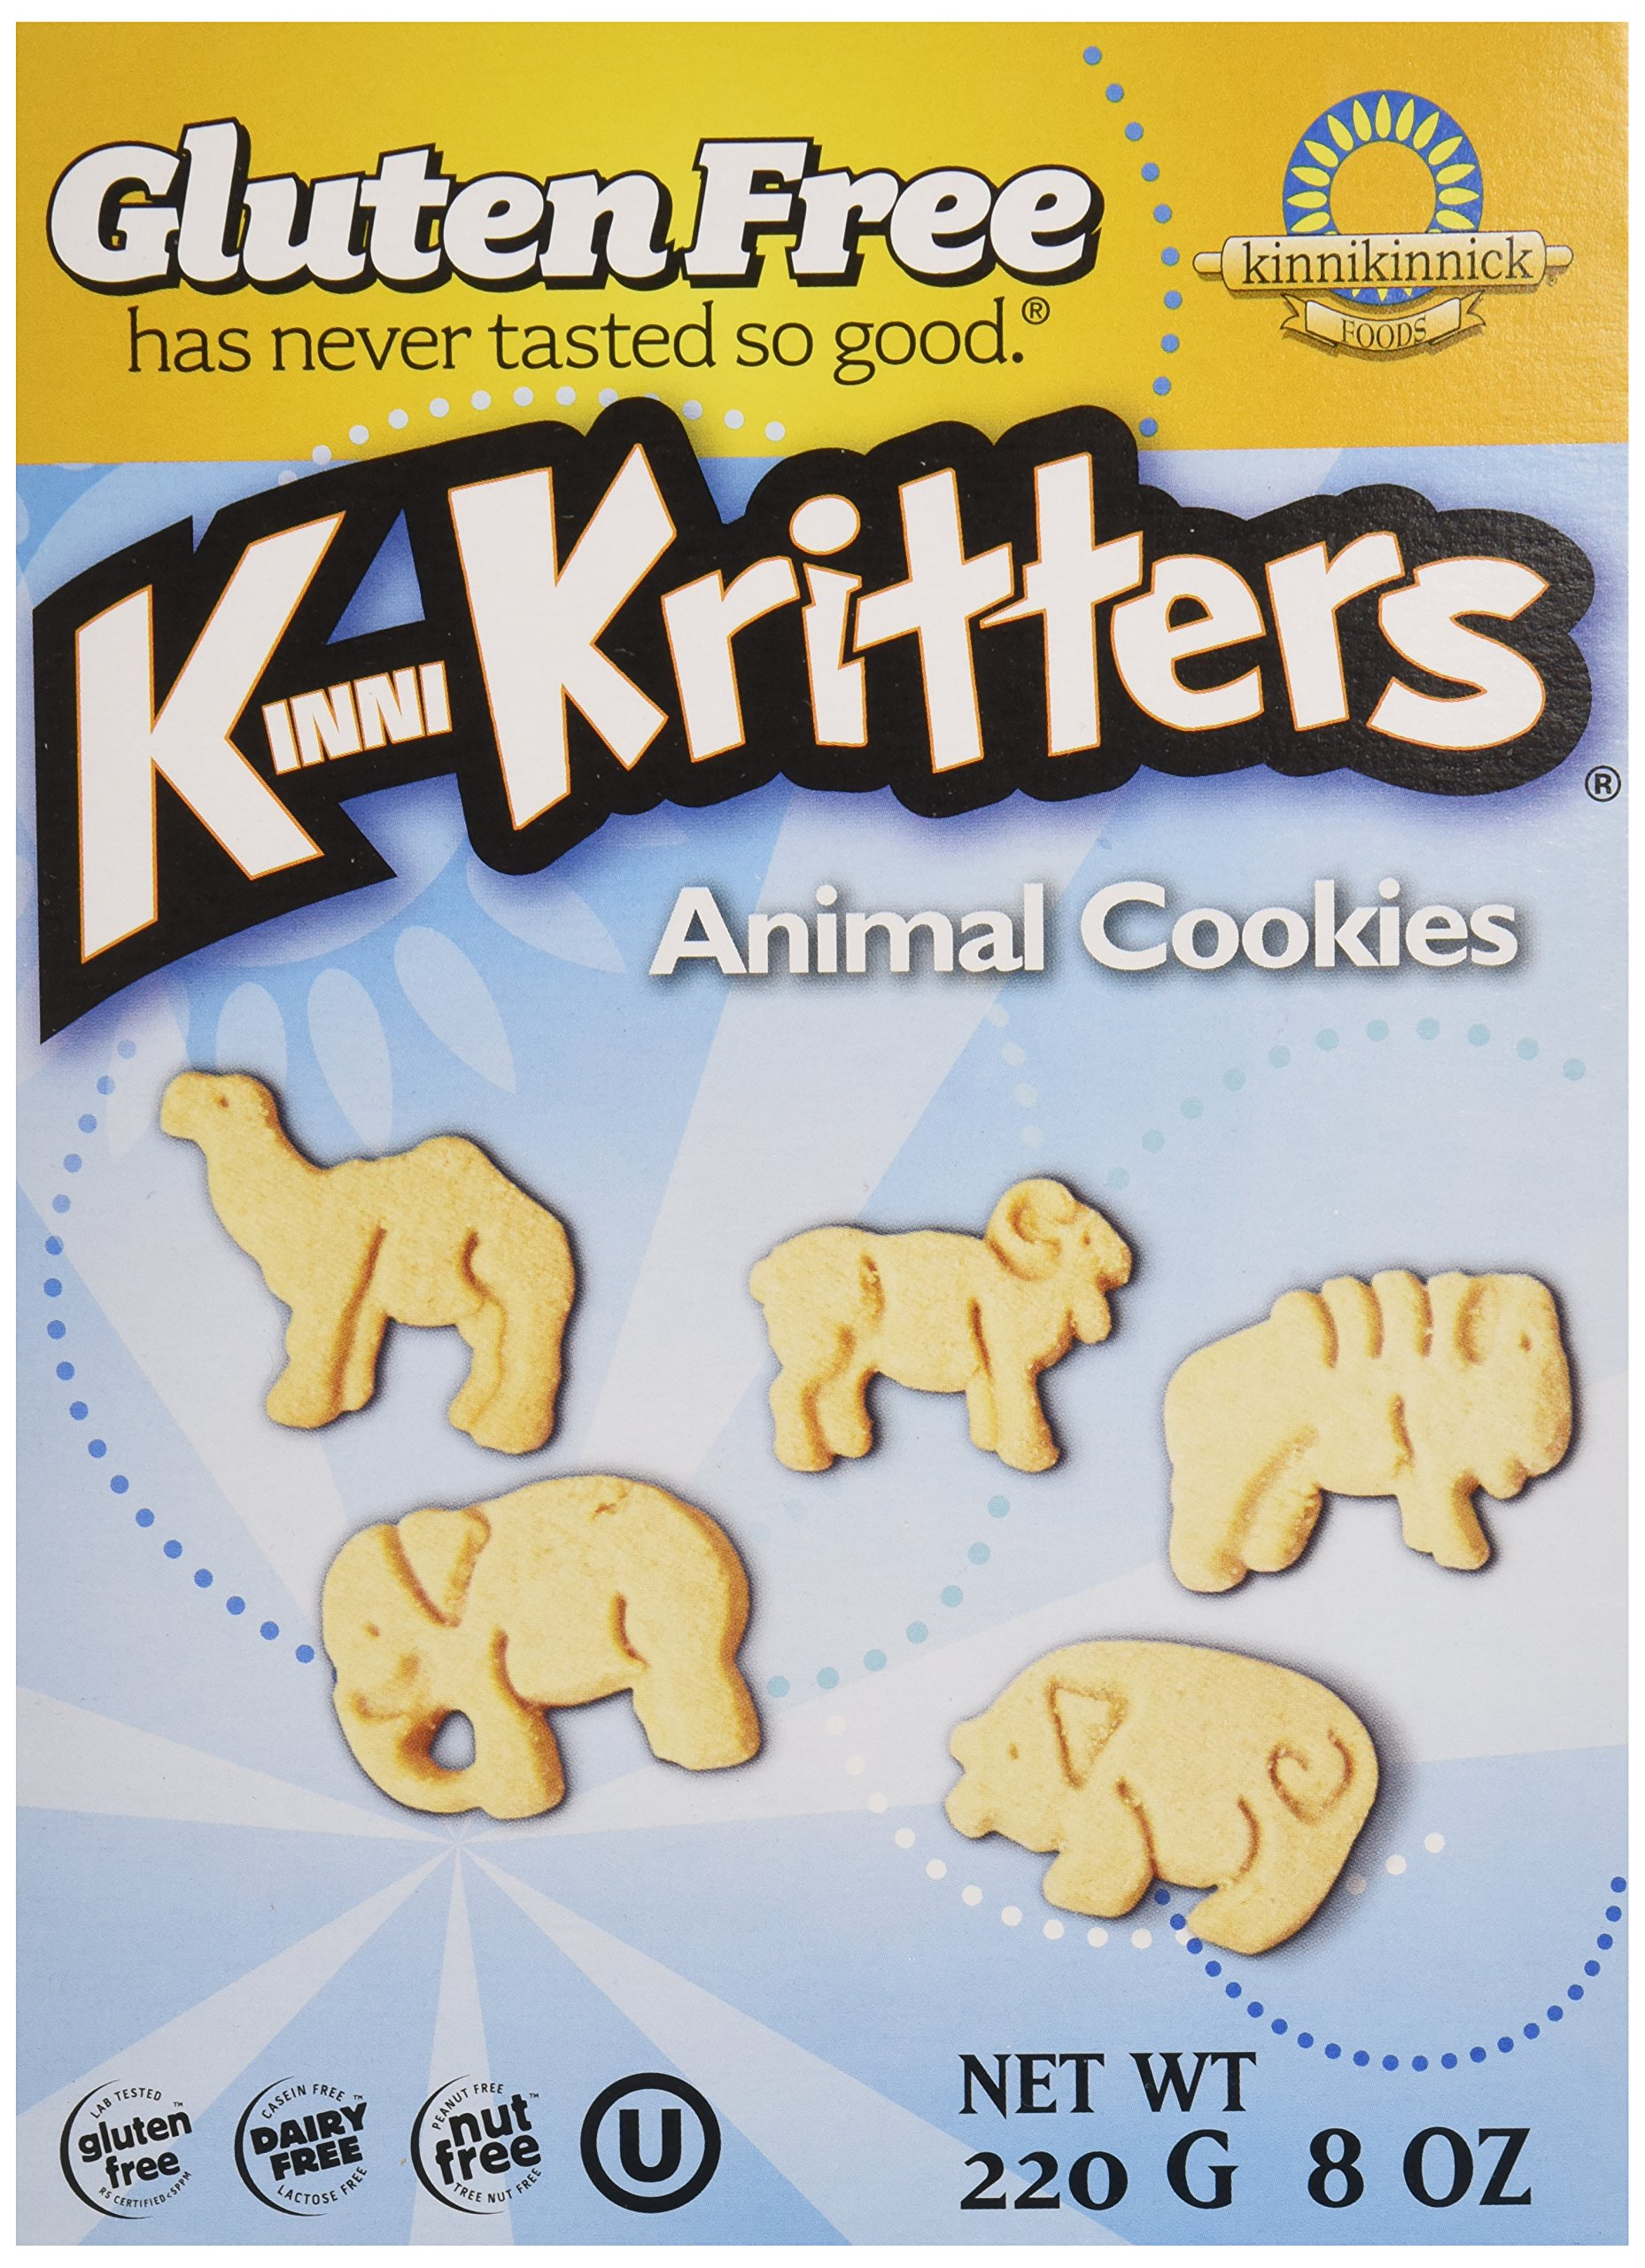 Kinnikinnick, Animal Cookies, Gluten Free, Wheat Free, Dairy Free, 8 oz